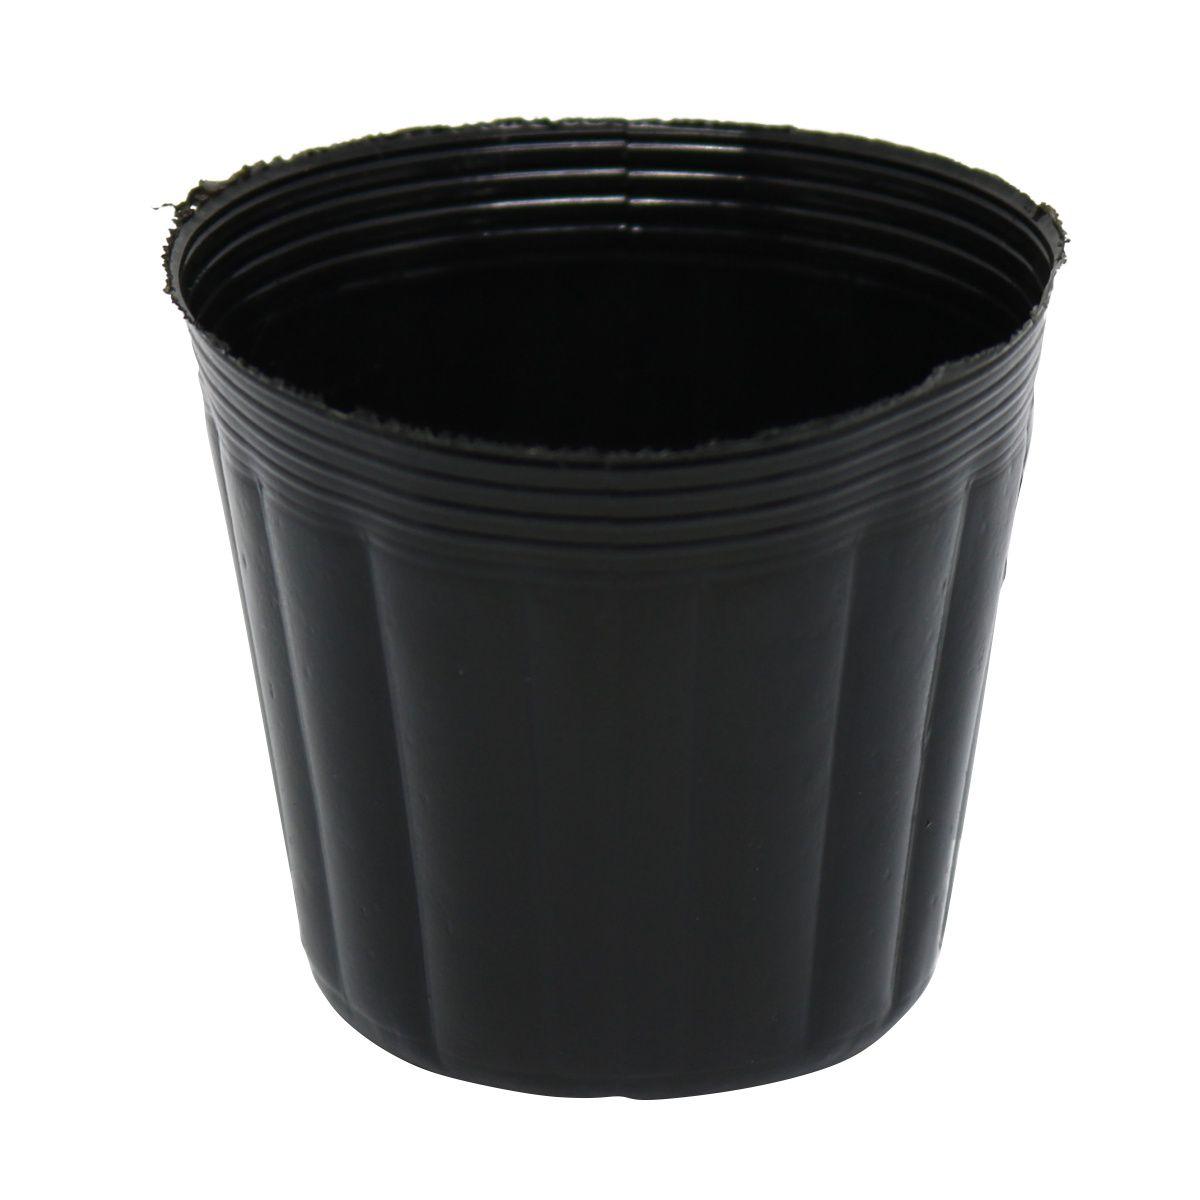 Vaso (embalagem) para muda Kit com 10 potes 150 ml